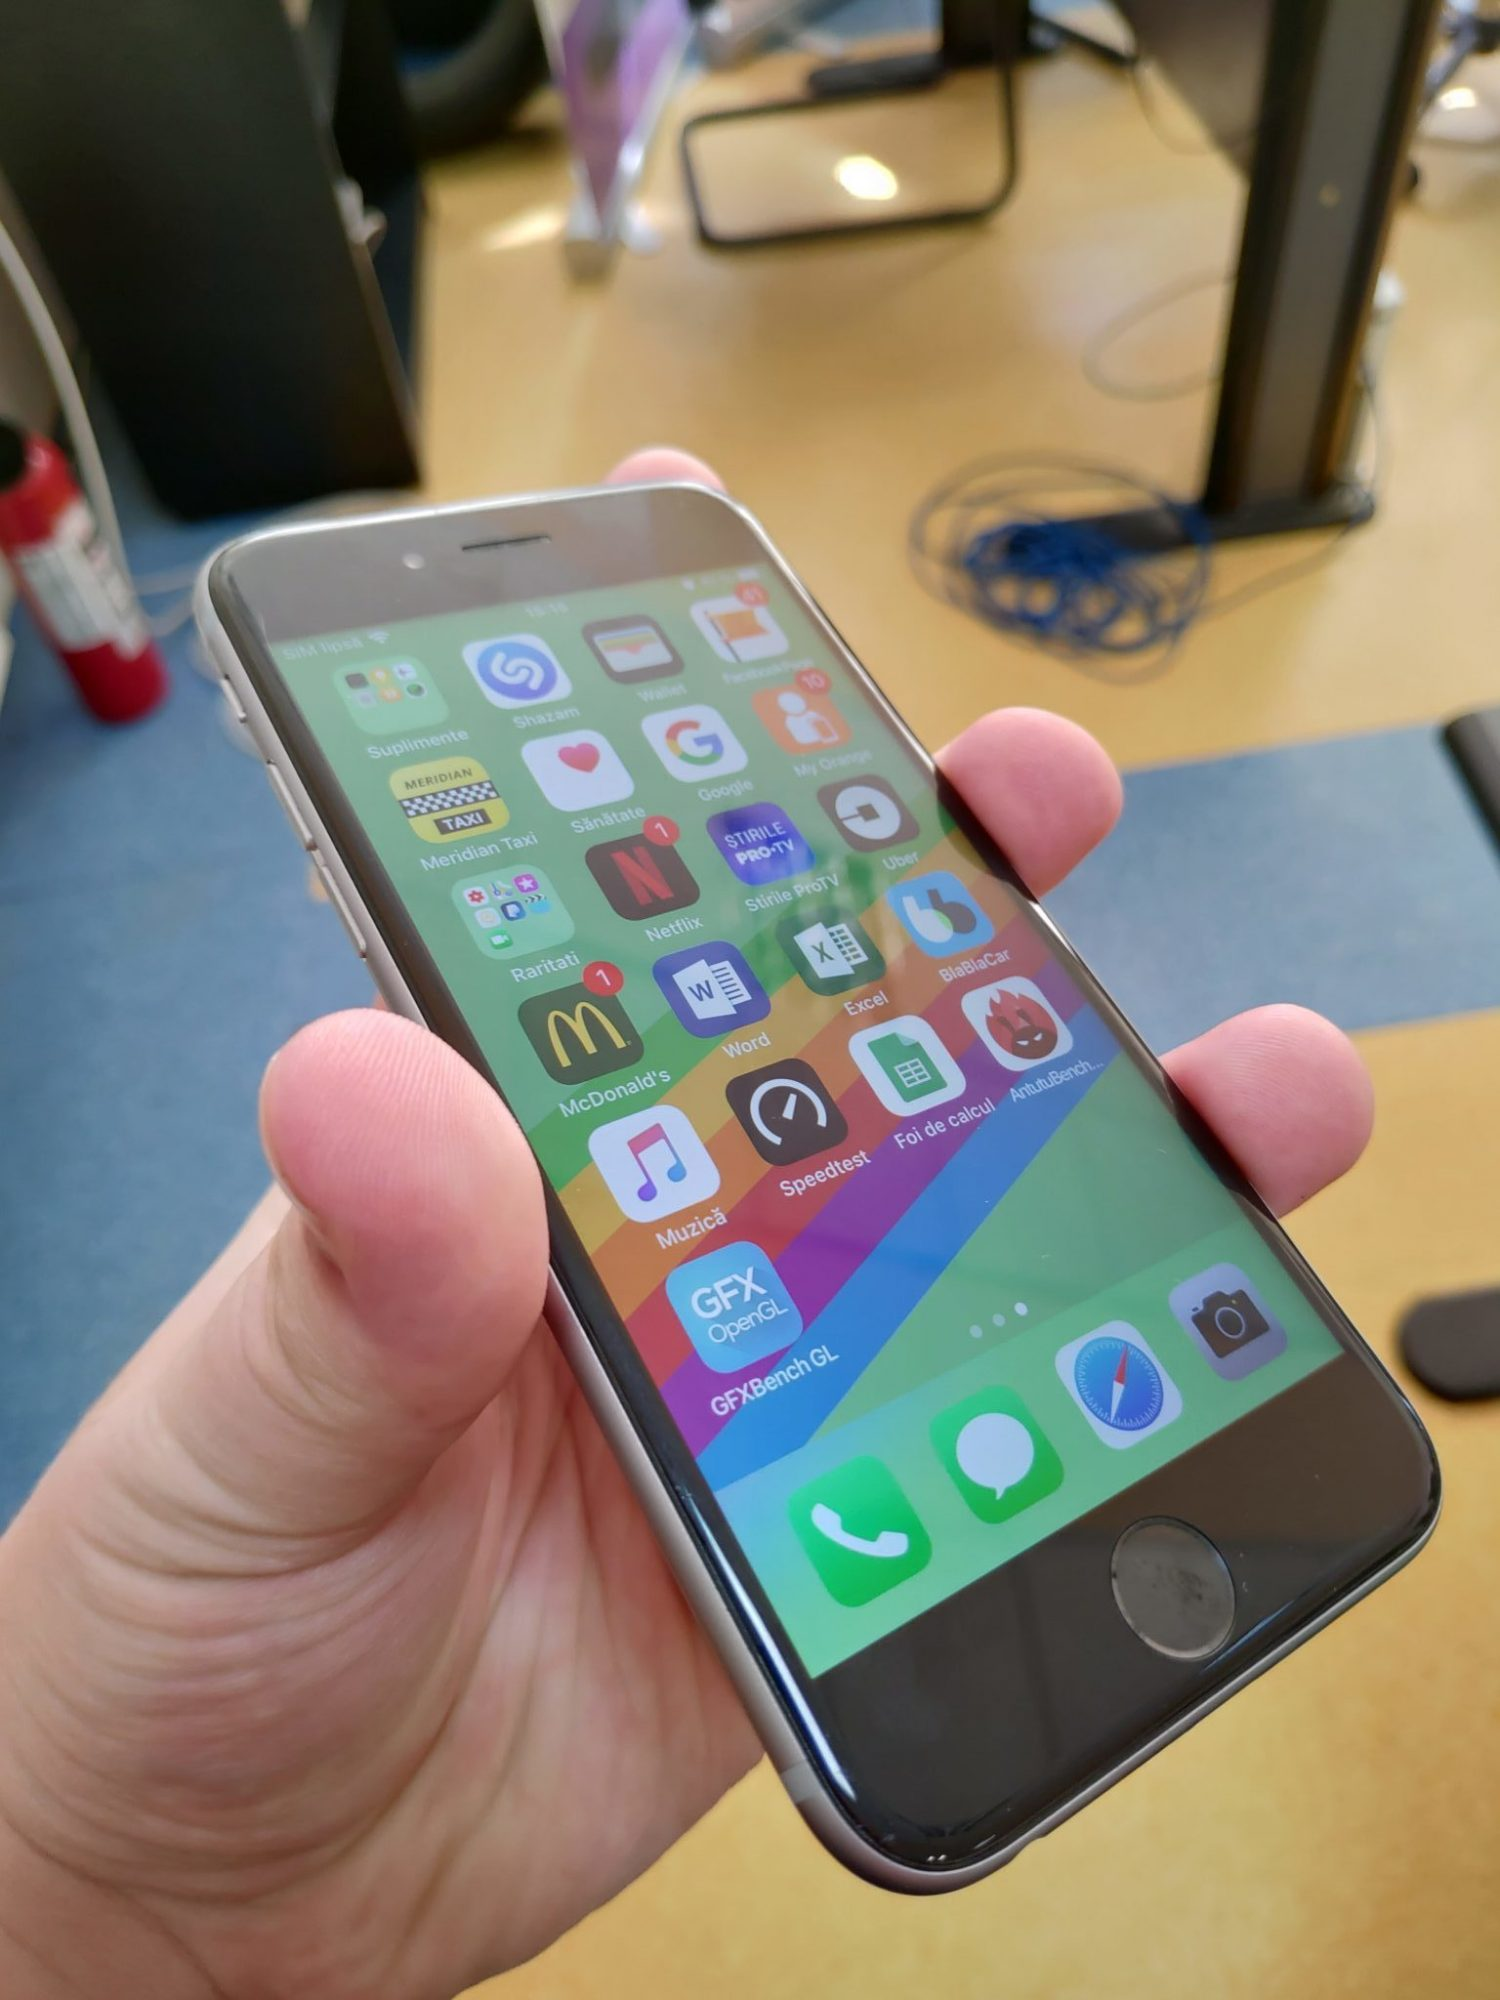 iphone-6s-11-e1536097403203.jpg?quality=